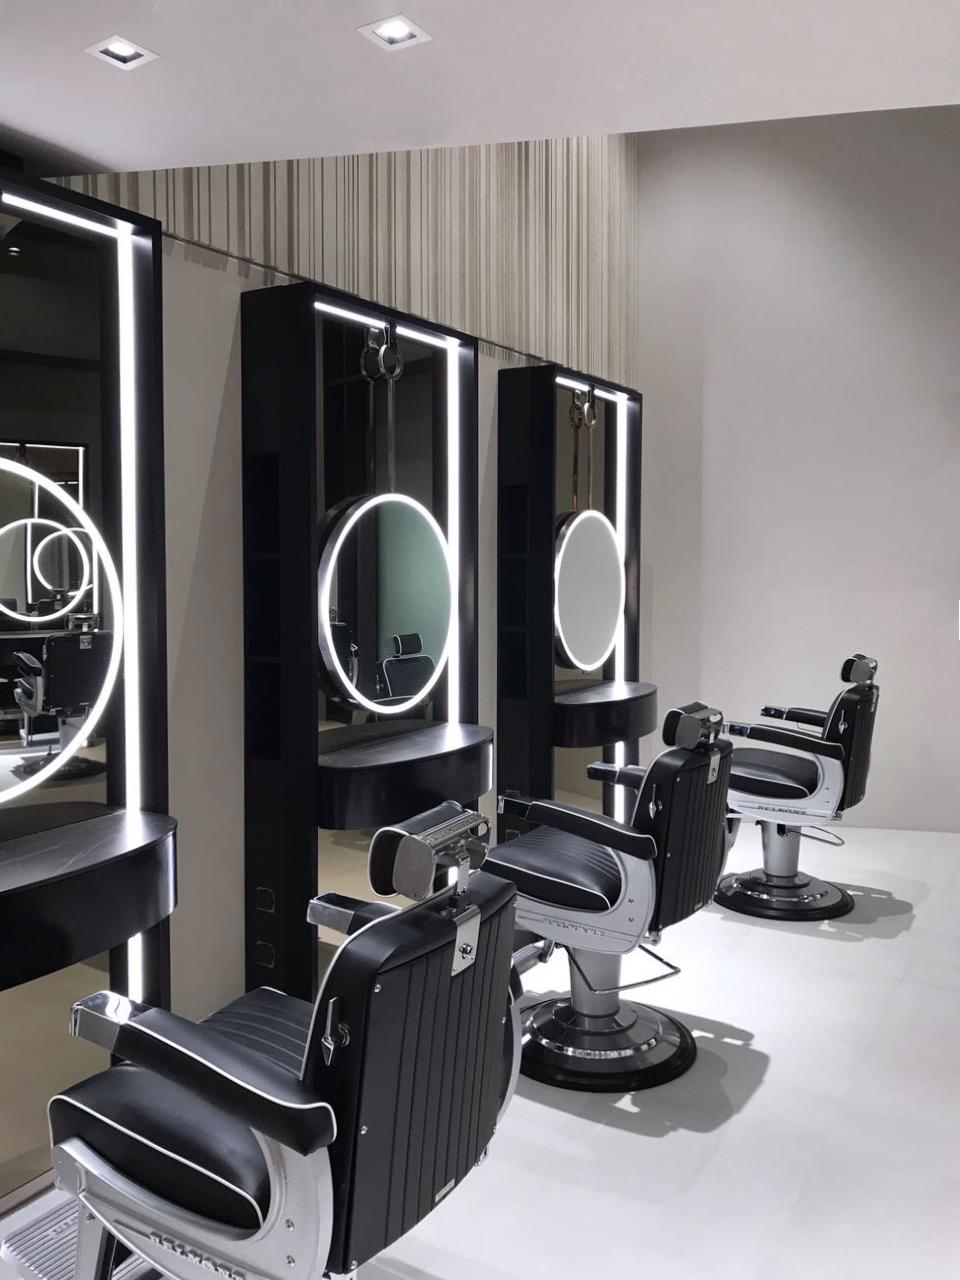 hairdressing-station_img_5388